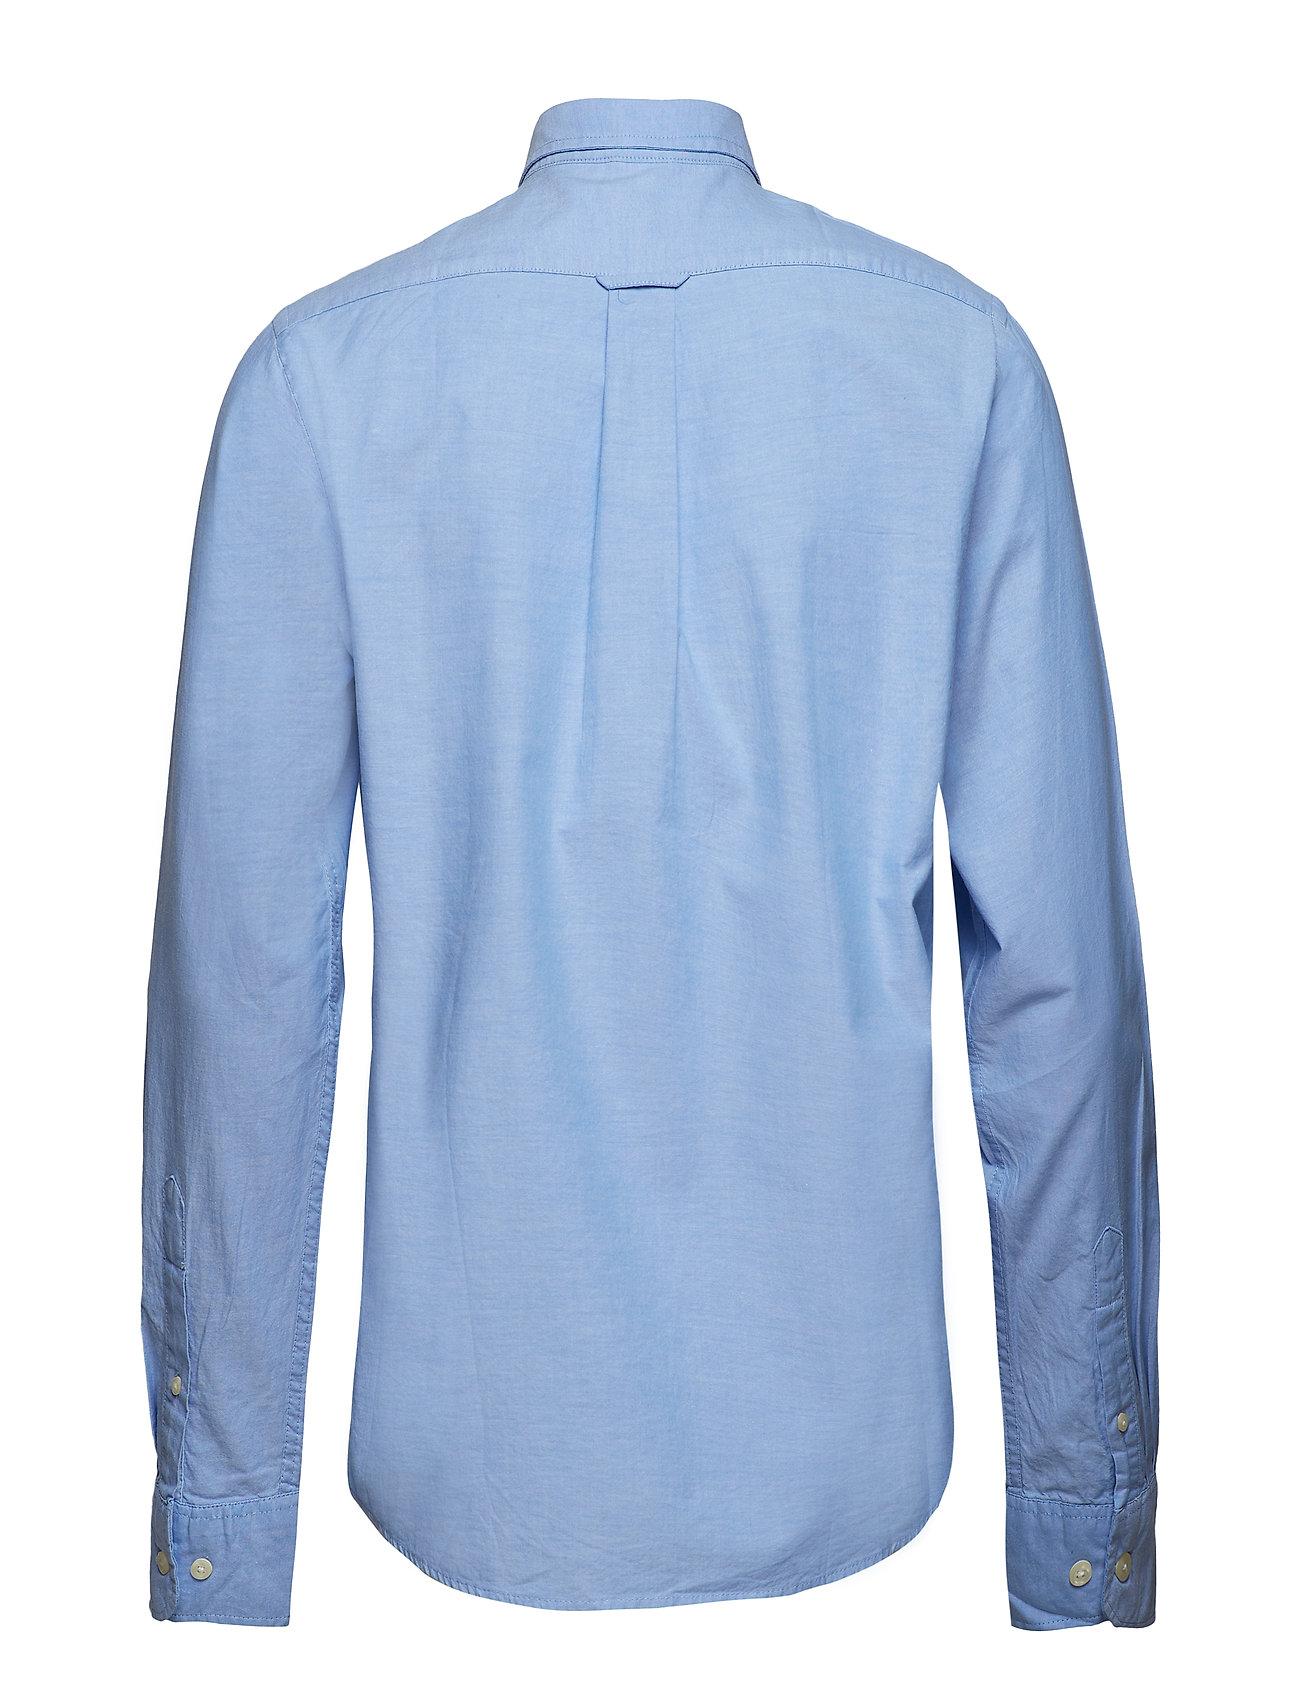 Bd RevivalIzod Oxford Bd Oxford Shirtblue Oxford Shirtblue RevivalIzod b6gyY7f